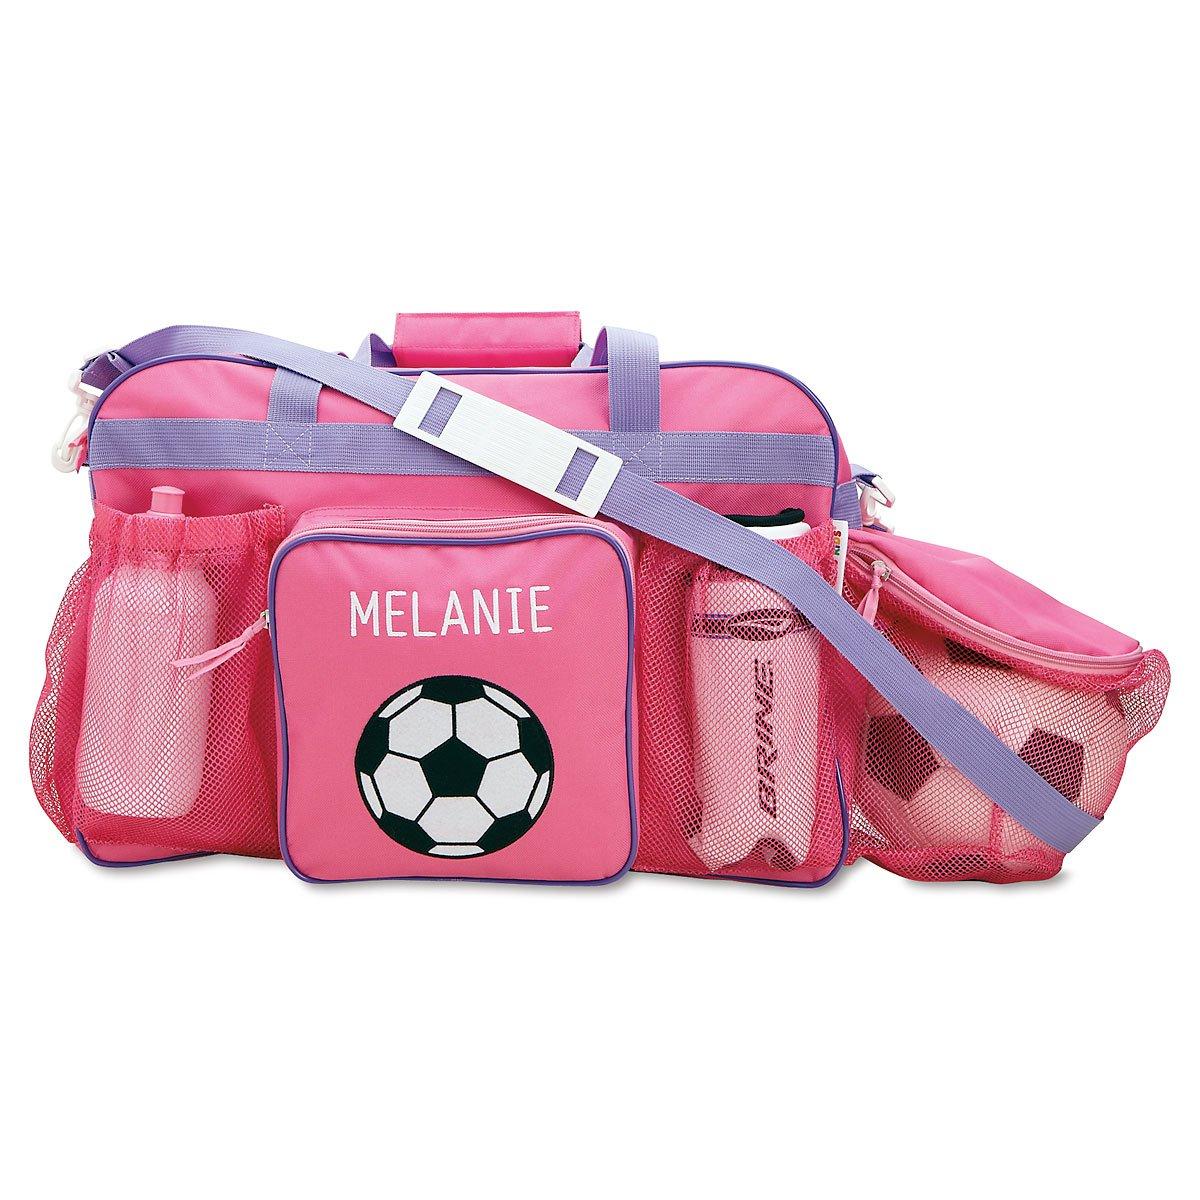 Personalized Kids Pink Soccer Sport Bag, 19'' Long, Girls Soccer Bag by Lillian Vernon